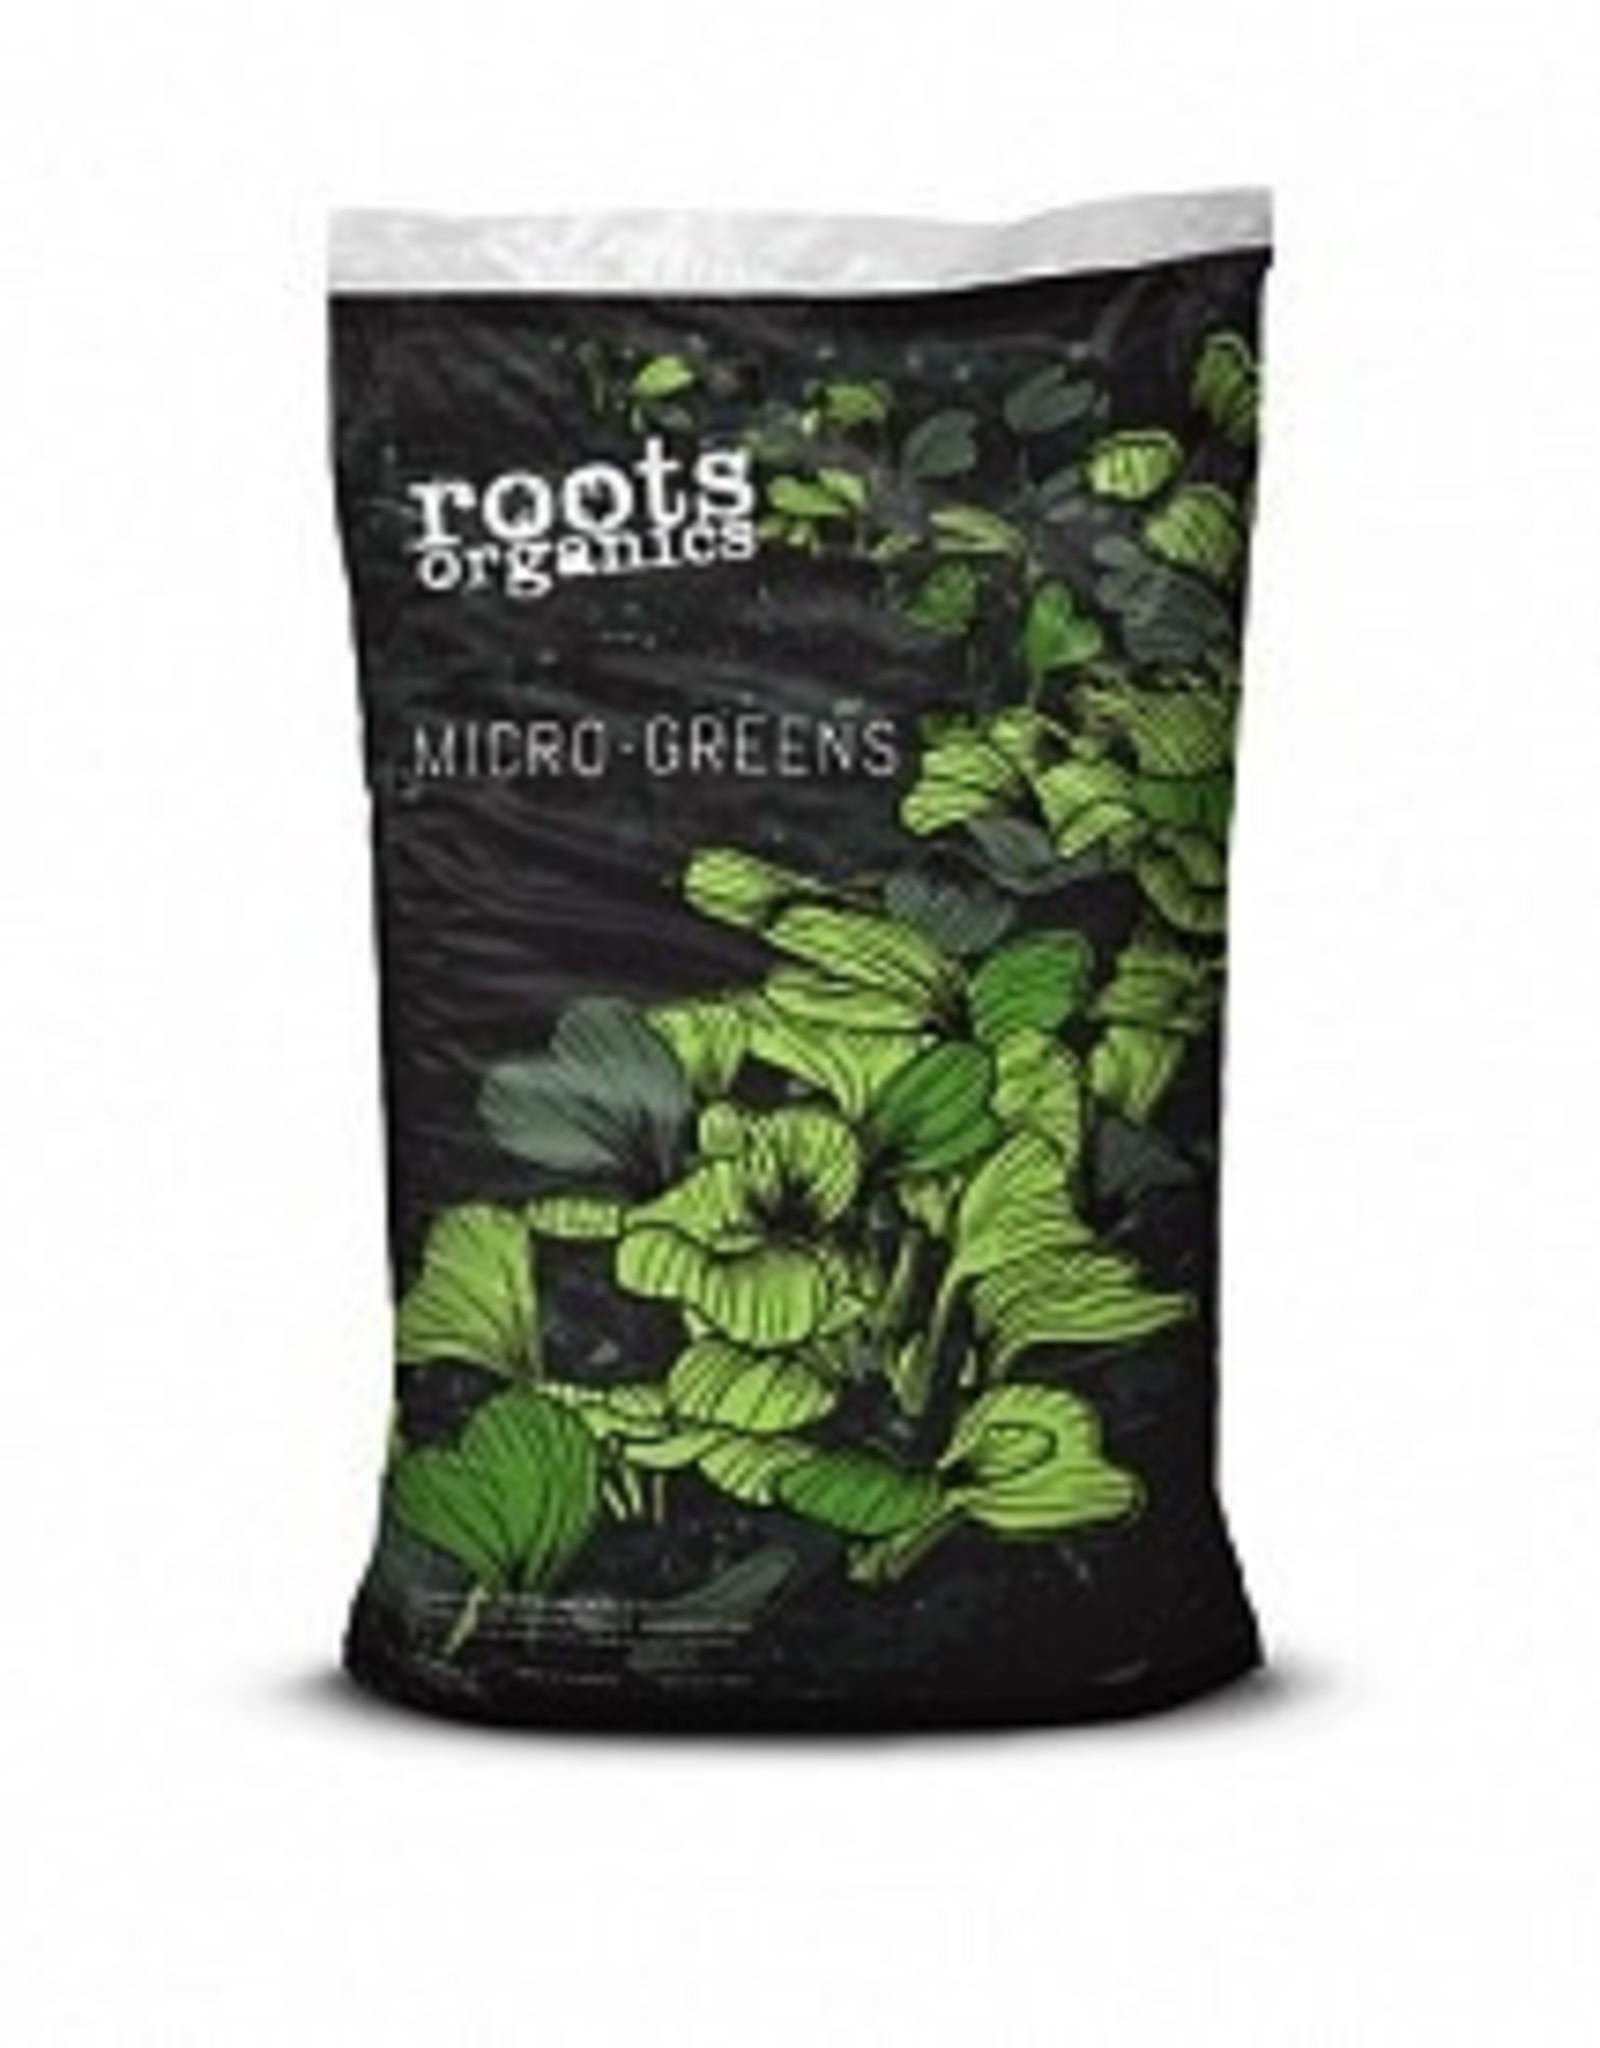 AURORA INNOVATIONS Roots Organics Micro-Greens, 1.5 cf